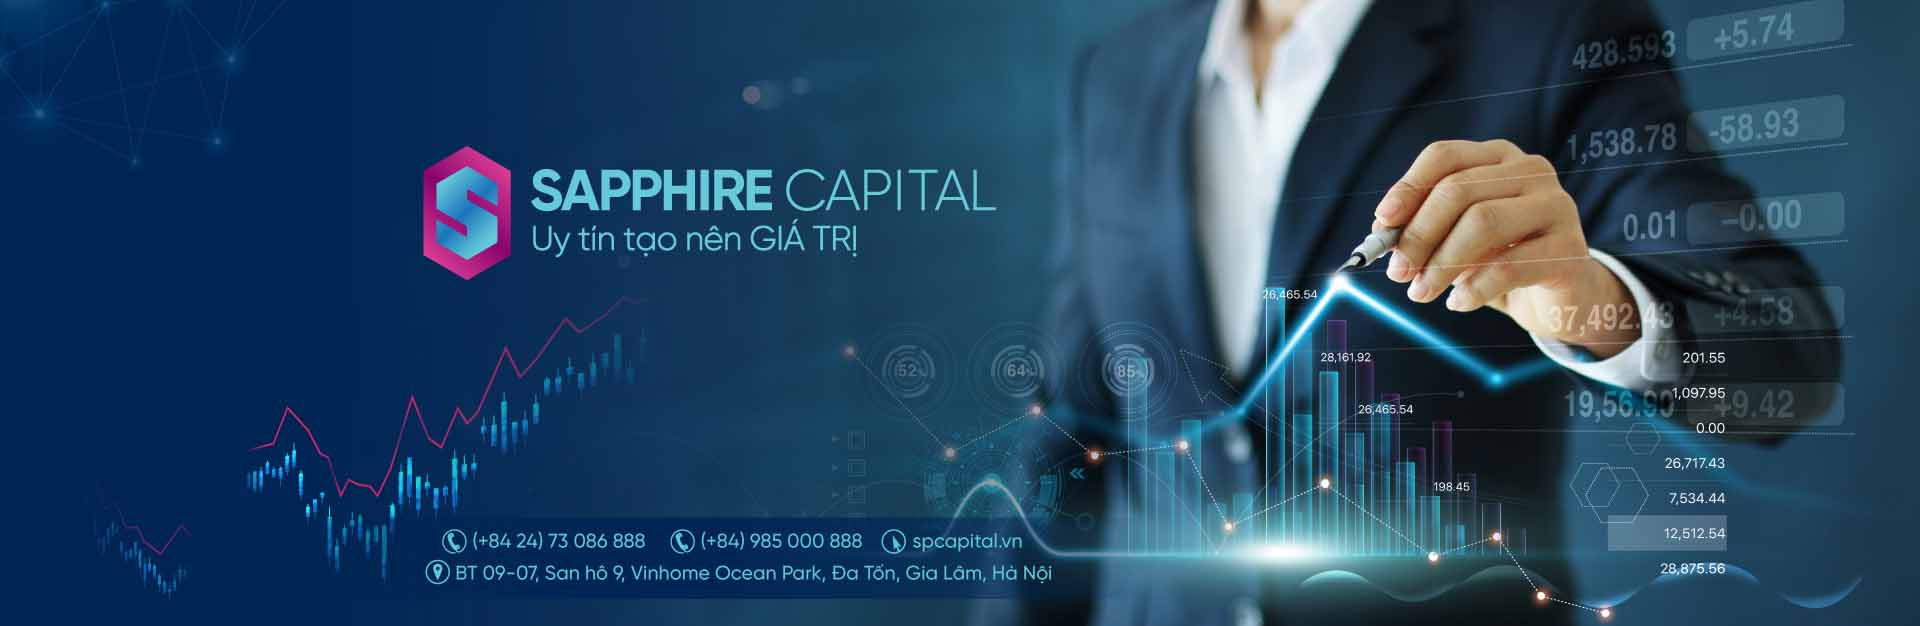 slide-sapphire-capital-fix-2